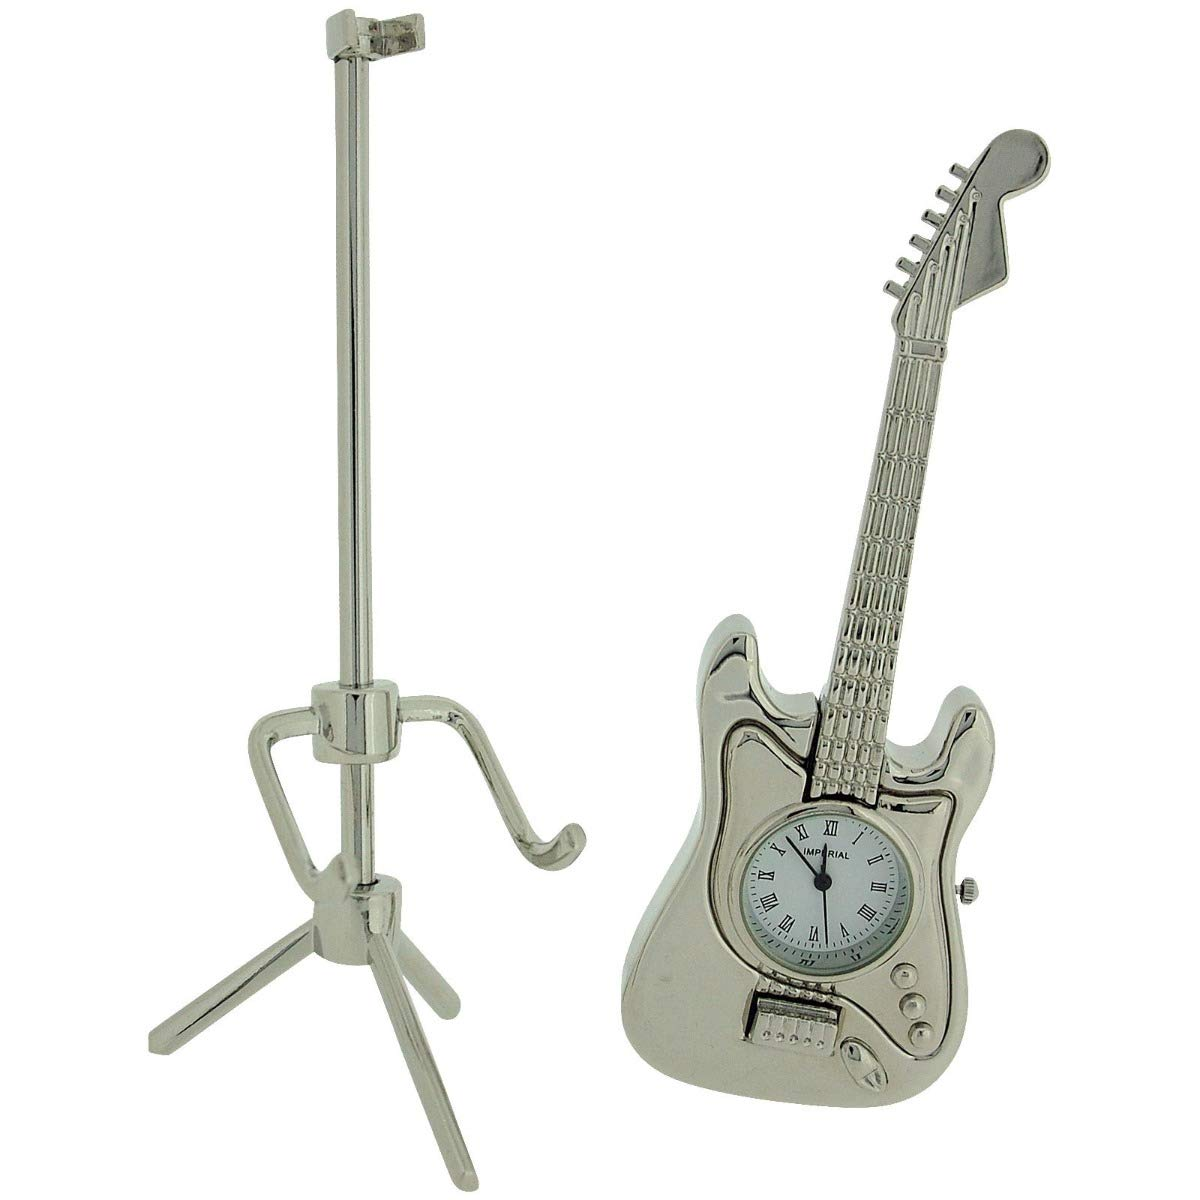 Miniature Silver Tone Metal Guitar Plus Stand Novelty Collectors Clock IMP85S